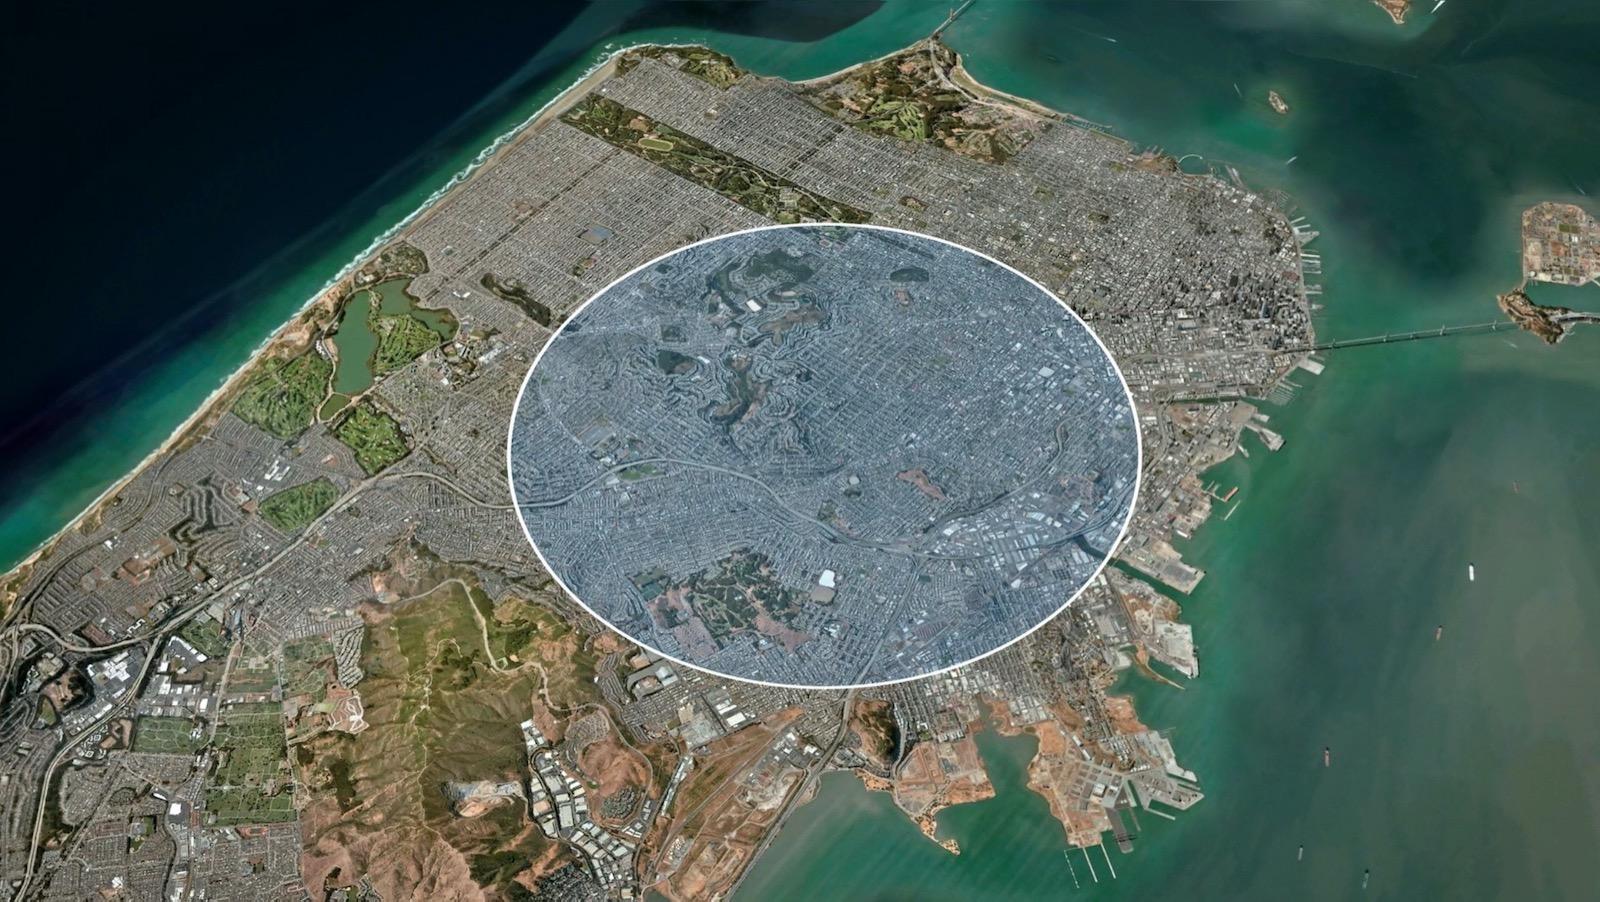 Proximate location sharing